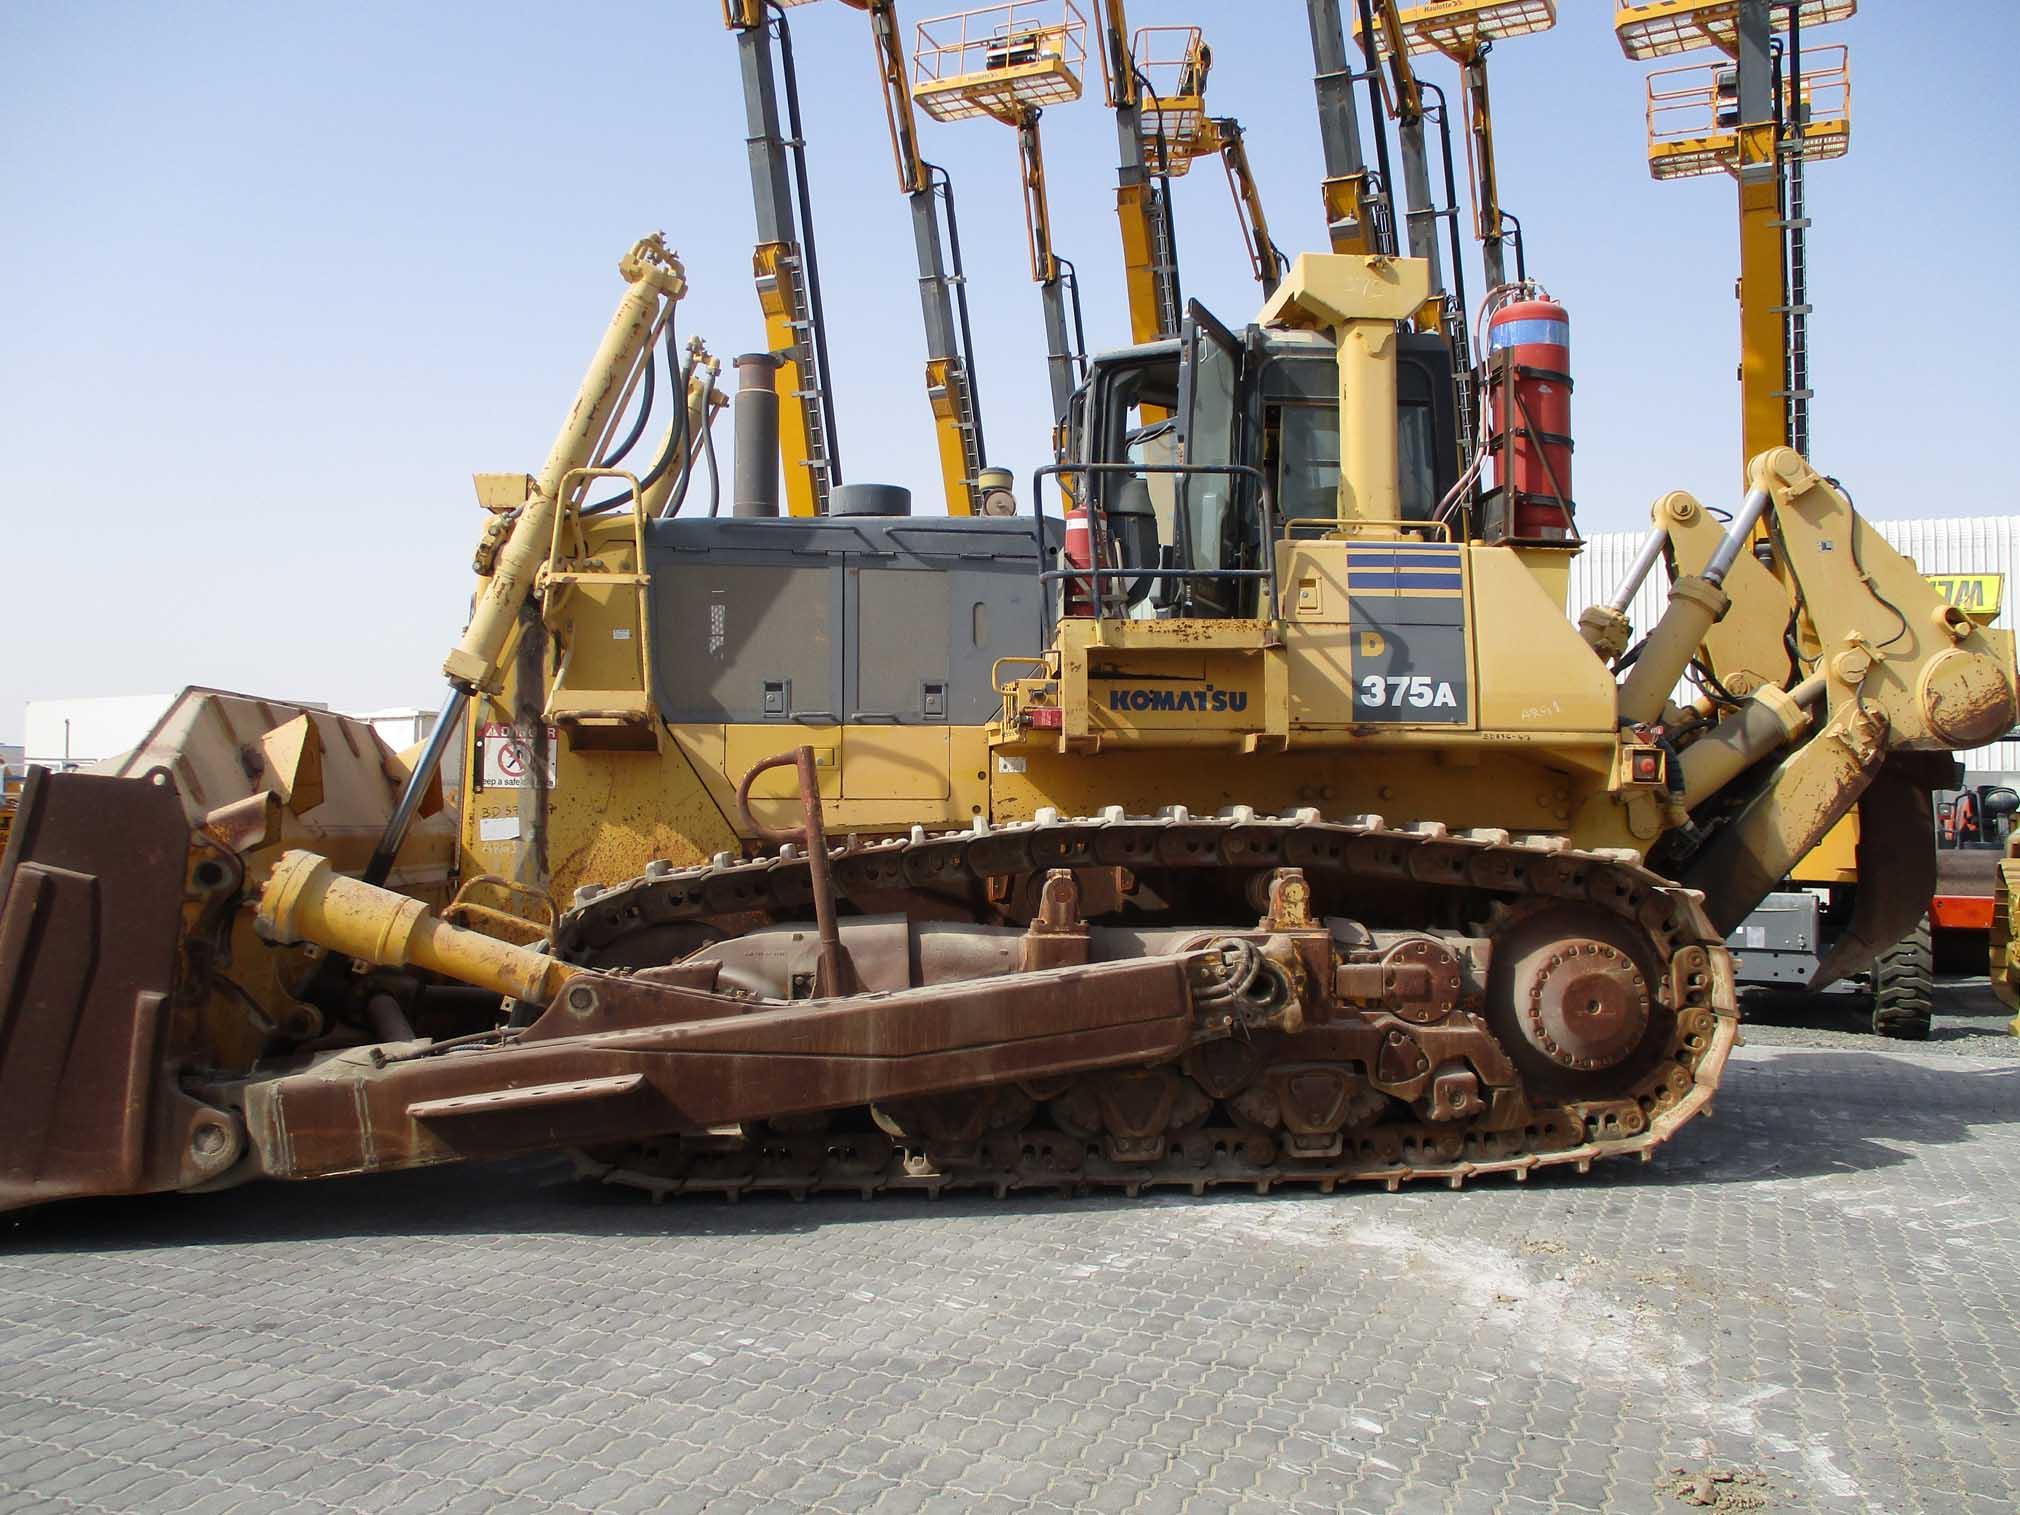 2008-komatsu-d375a-equipment-cover-image